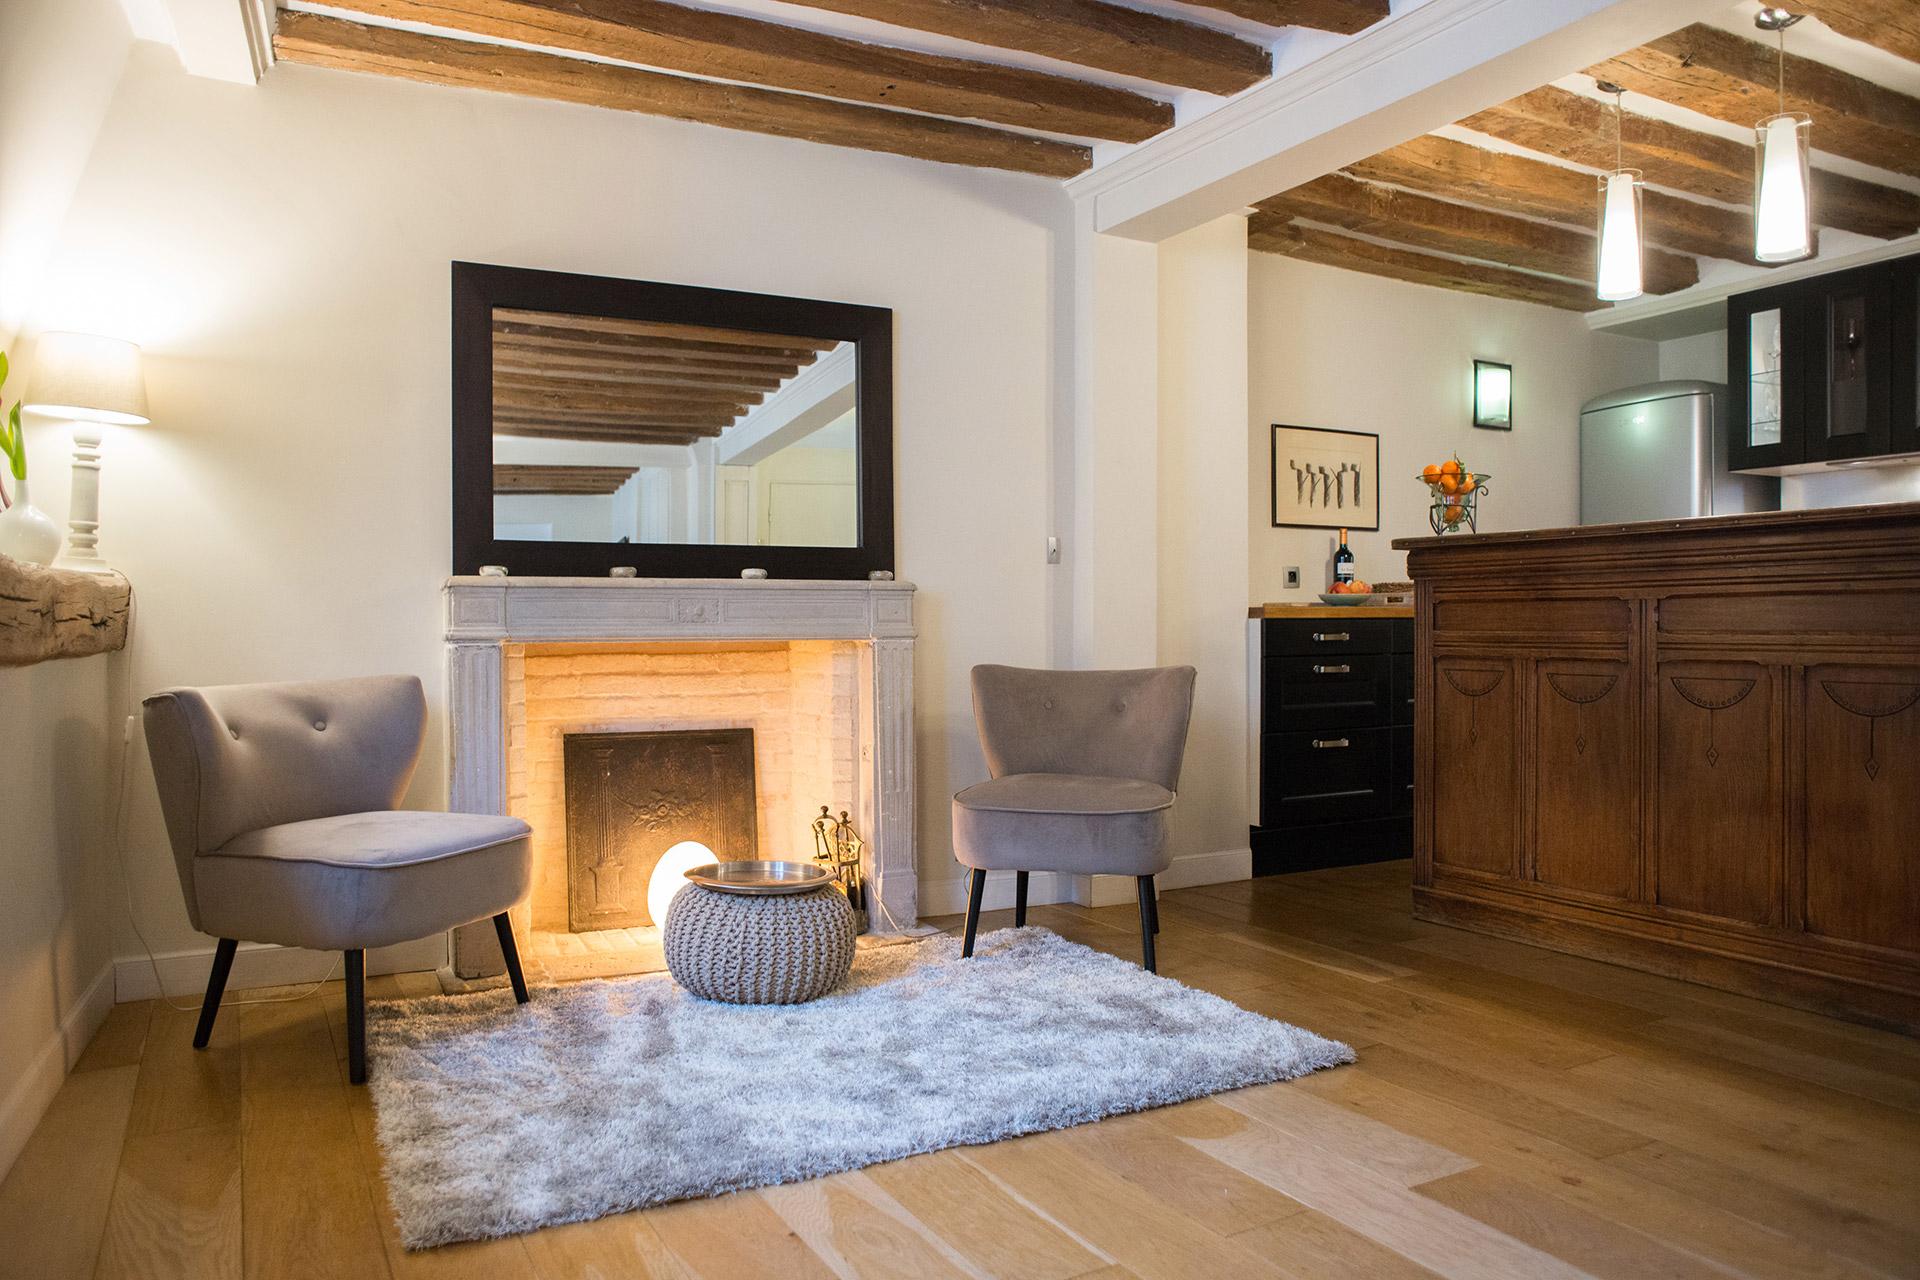 2 Bed 5 Bath Paris Vacation Rental In The 4th Arrondist